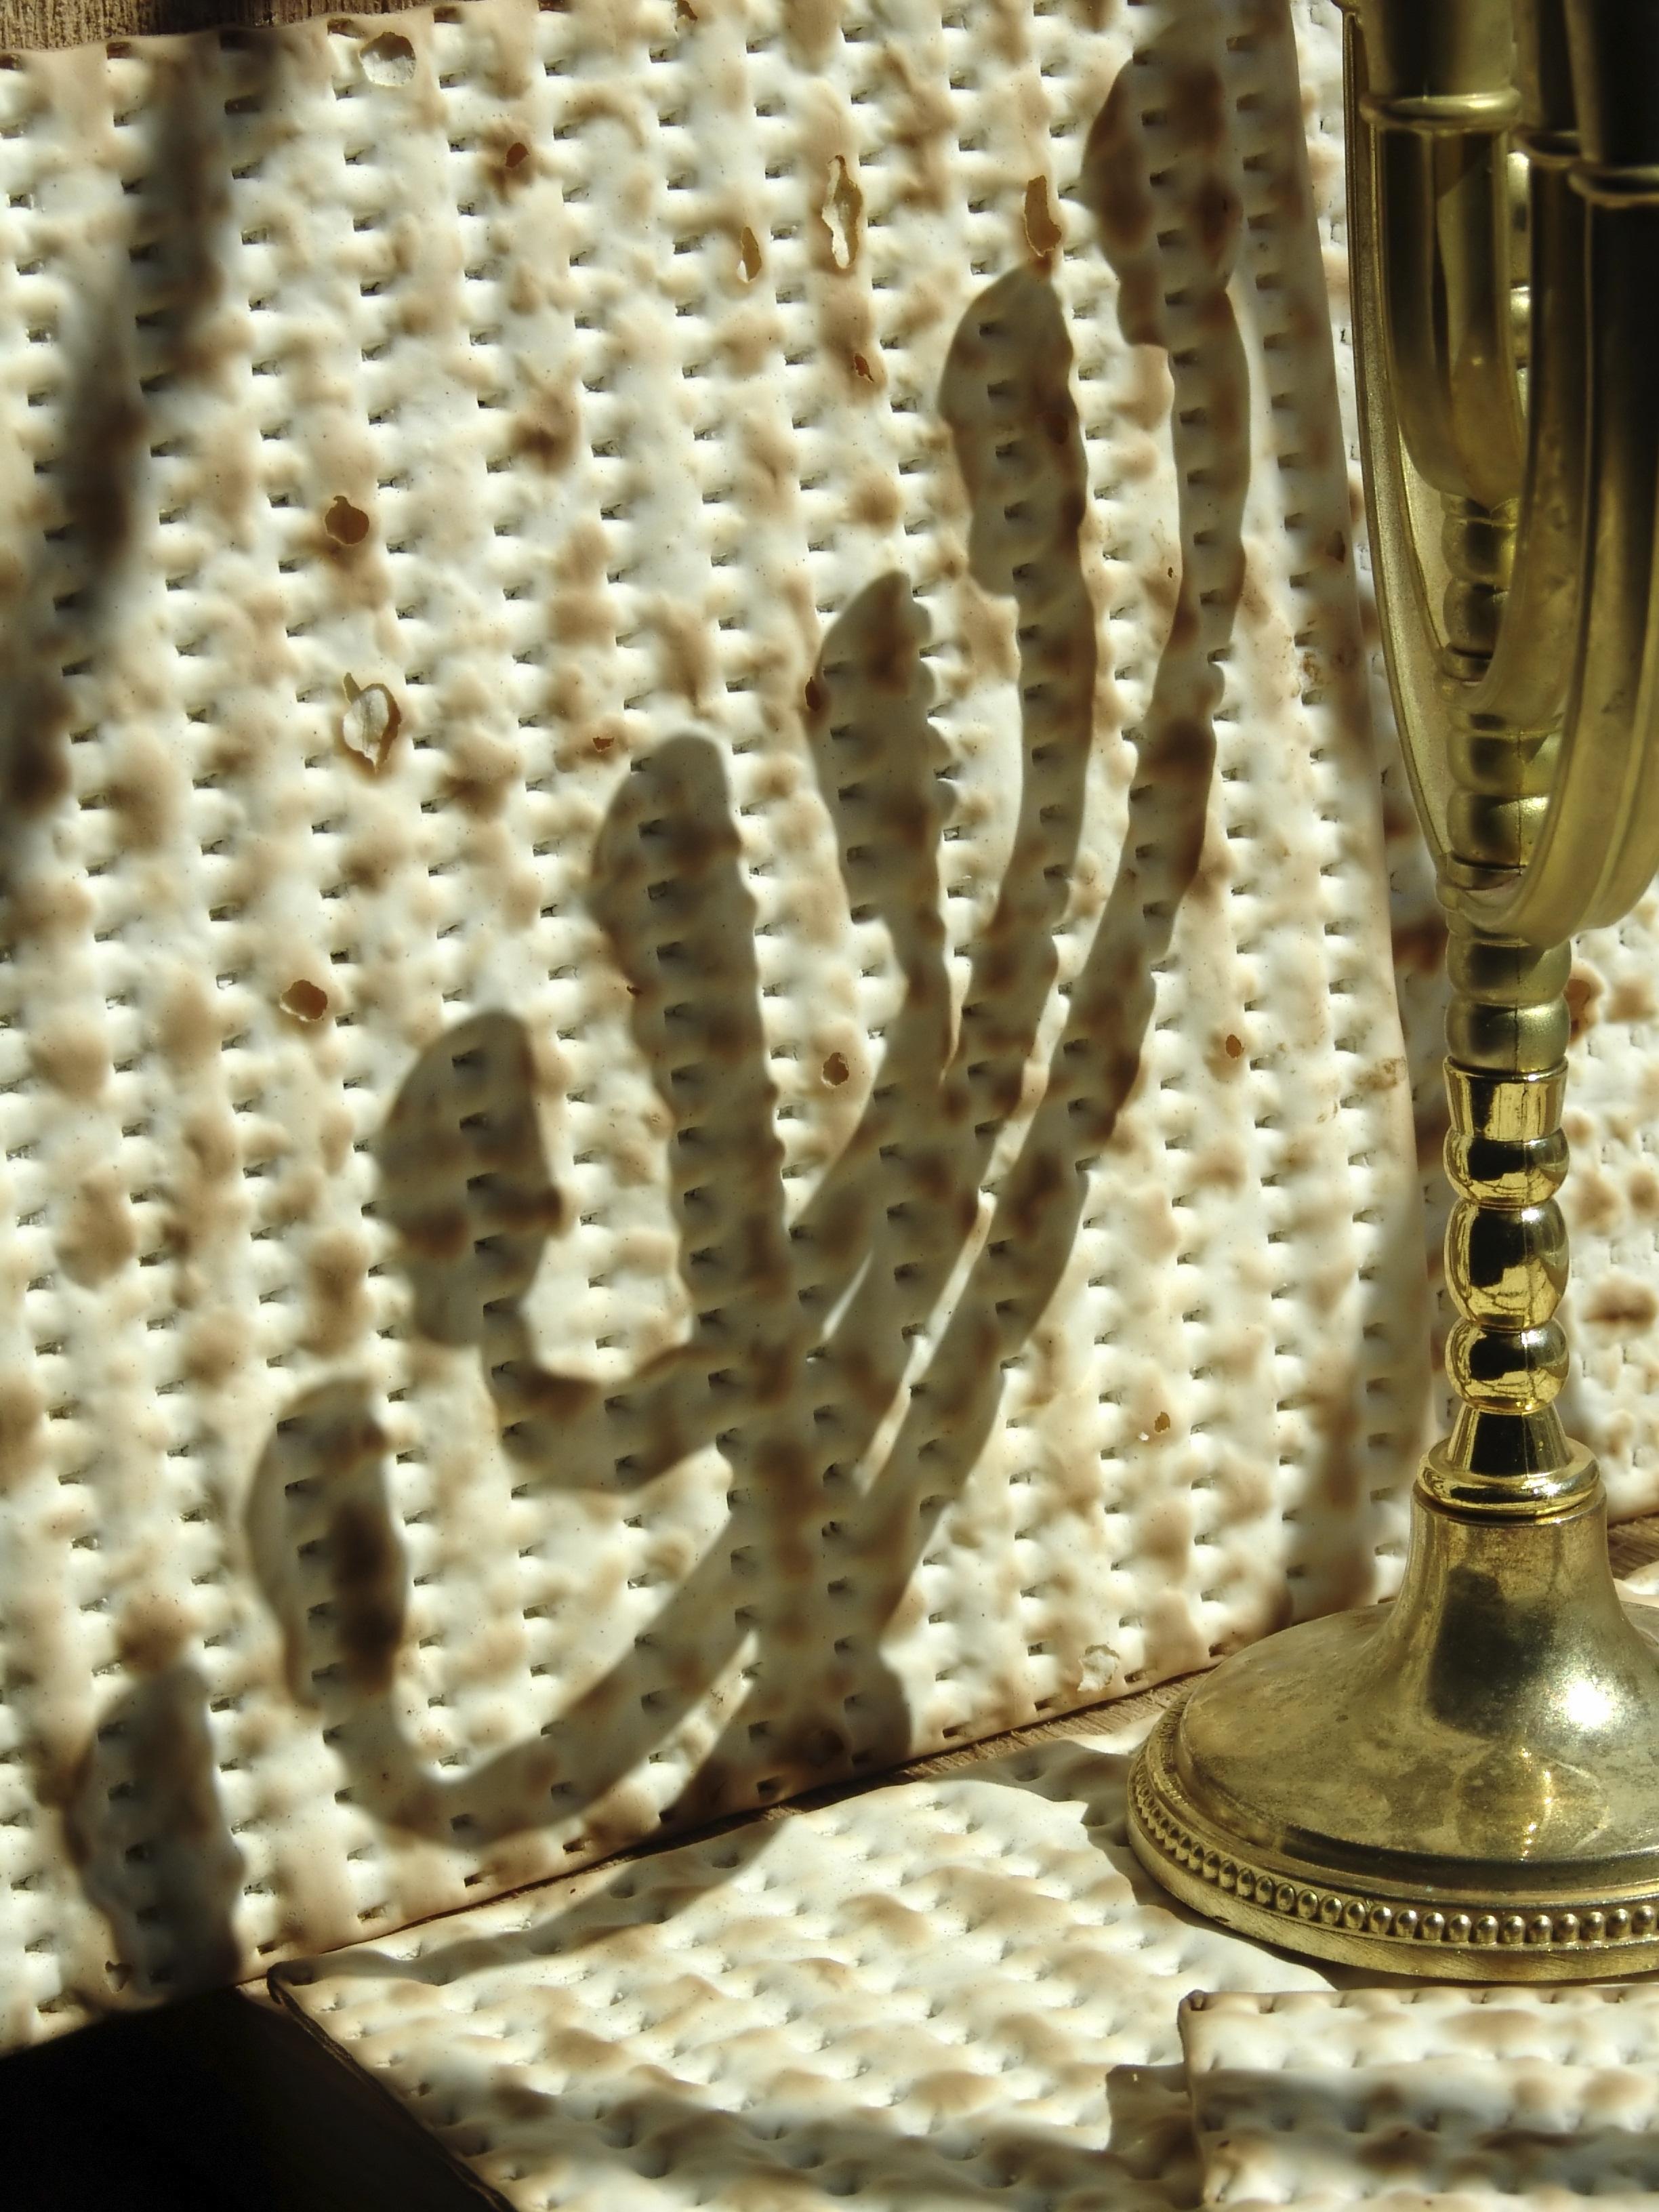 Bruce Levy Memorial 2020 JFS Passover Food Baskets Program